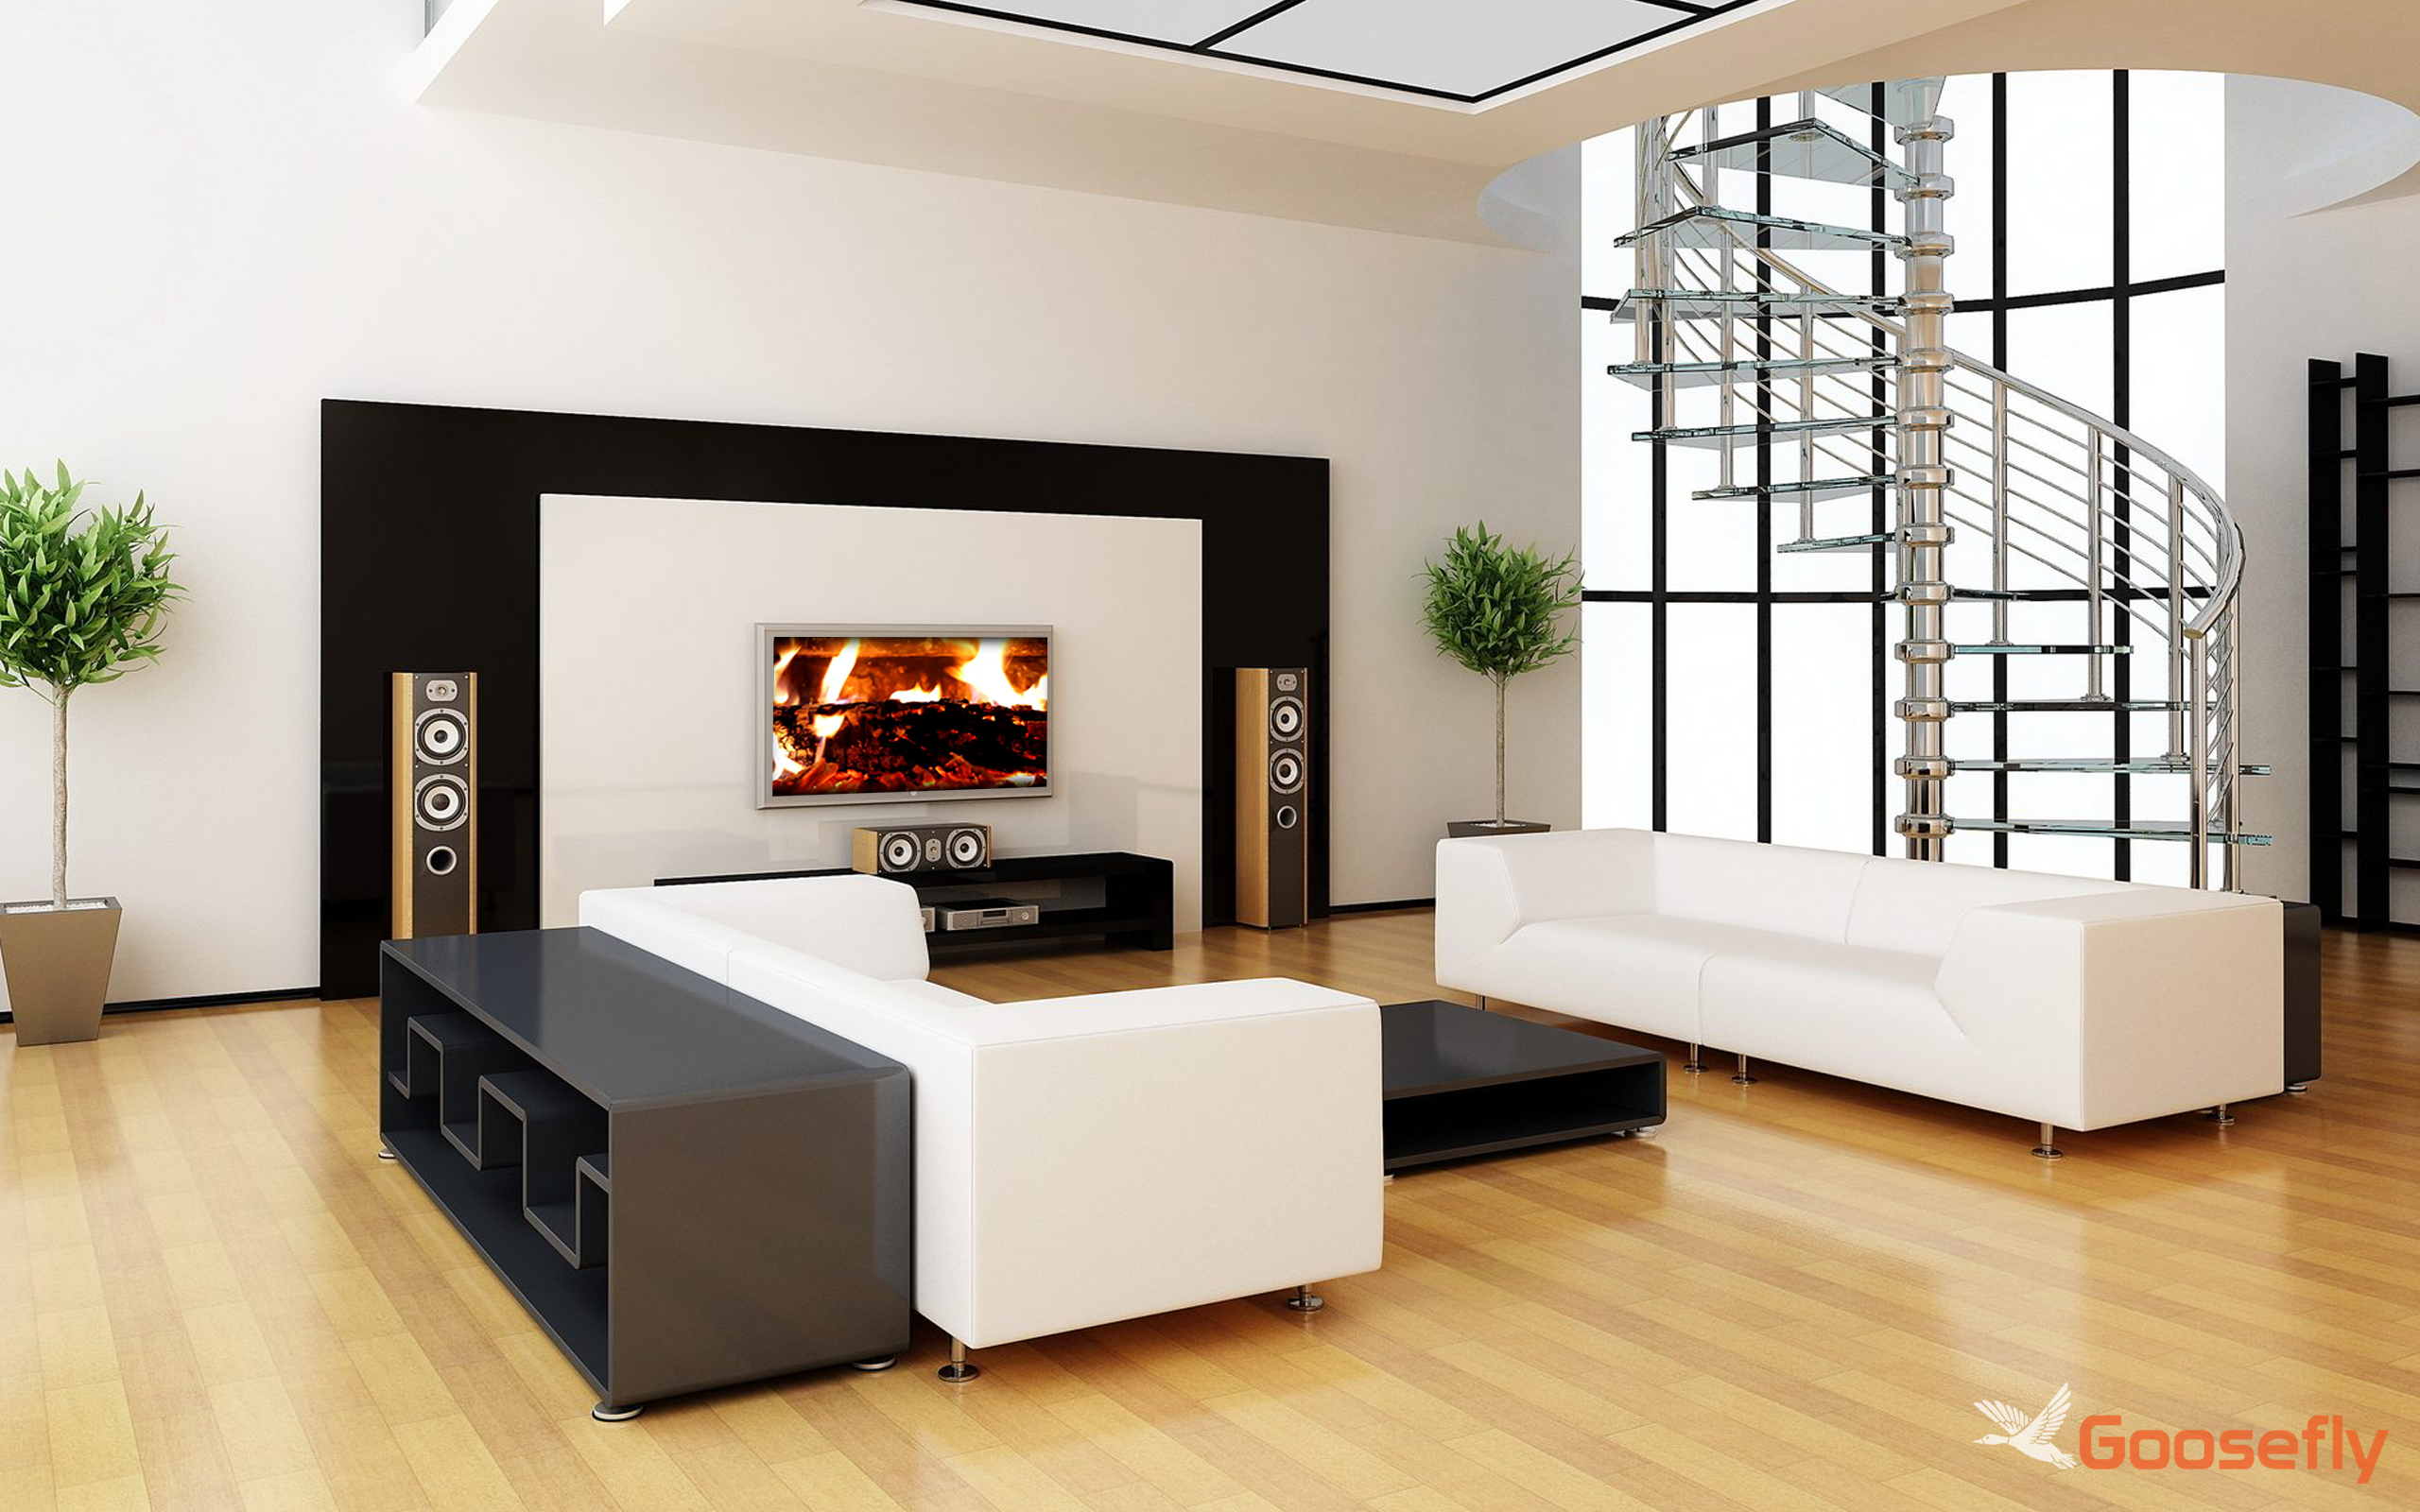 acogedora chimenea HD GRATIS: decora tu sala de TV con una ...